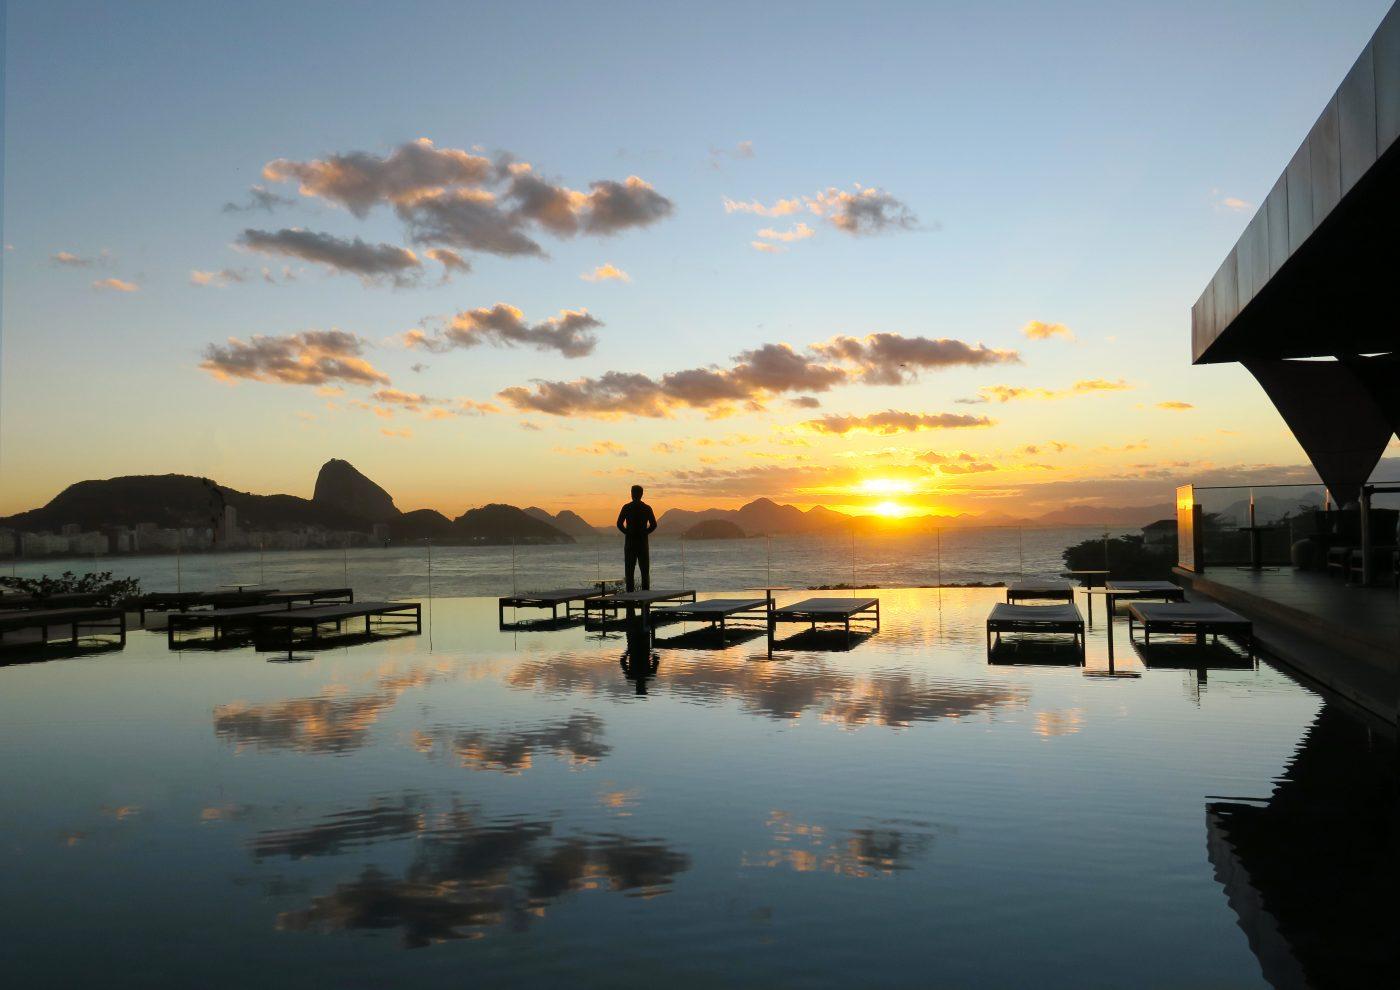 1-Infinity Pool at Fairmont Hotel & Resort Copacabana - Rio de Janeiro-architect Patricia Anastassiadis